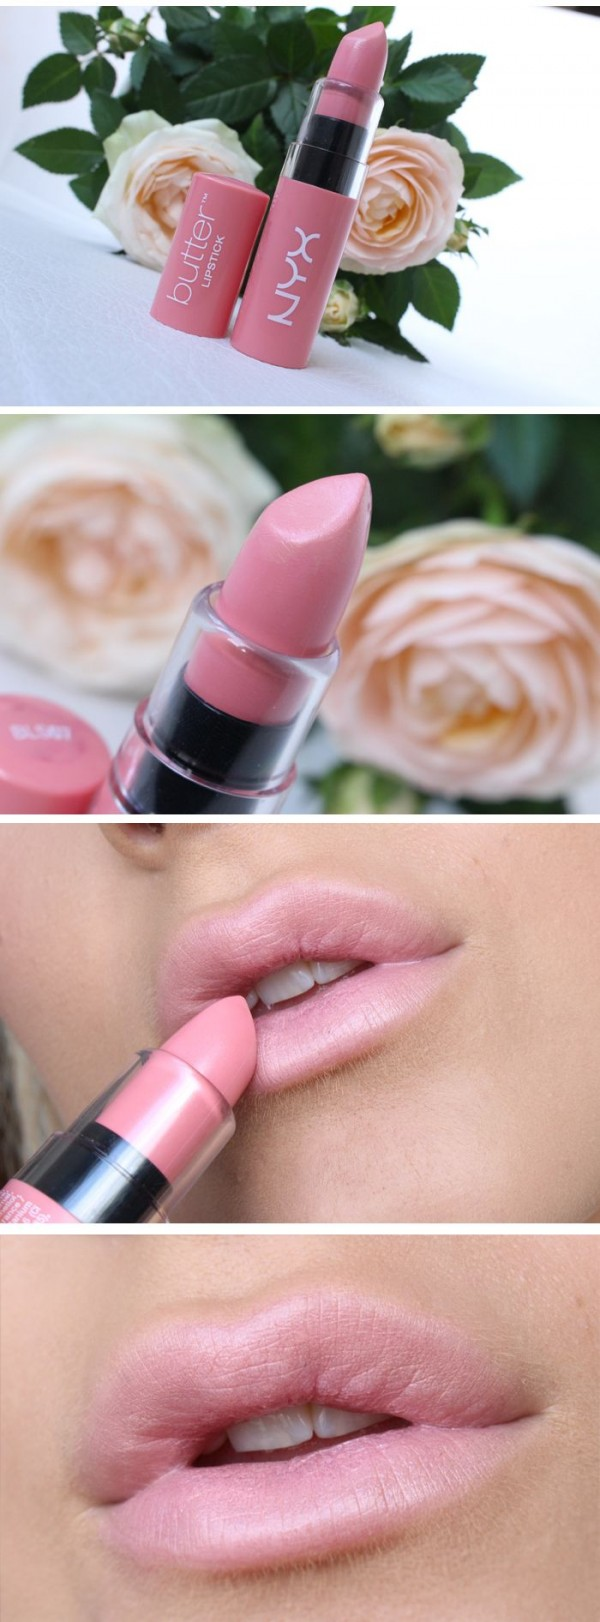 labial rosado